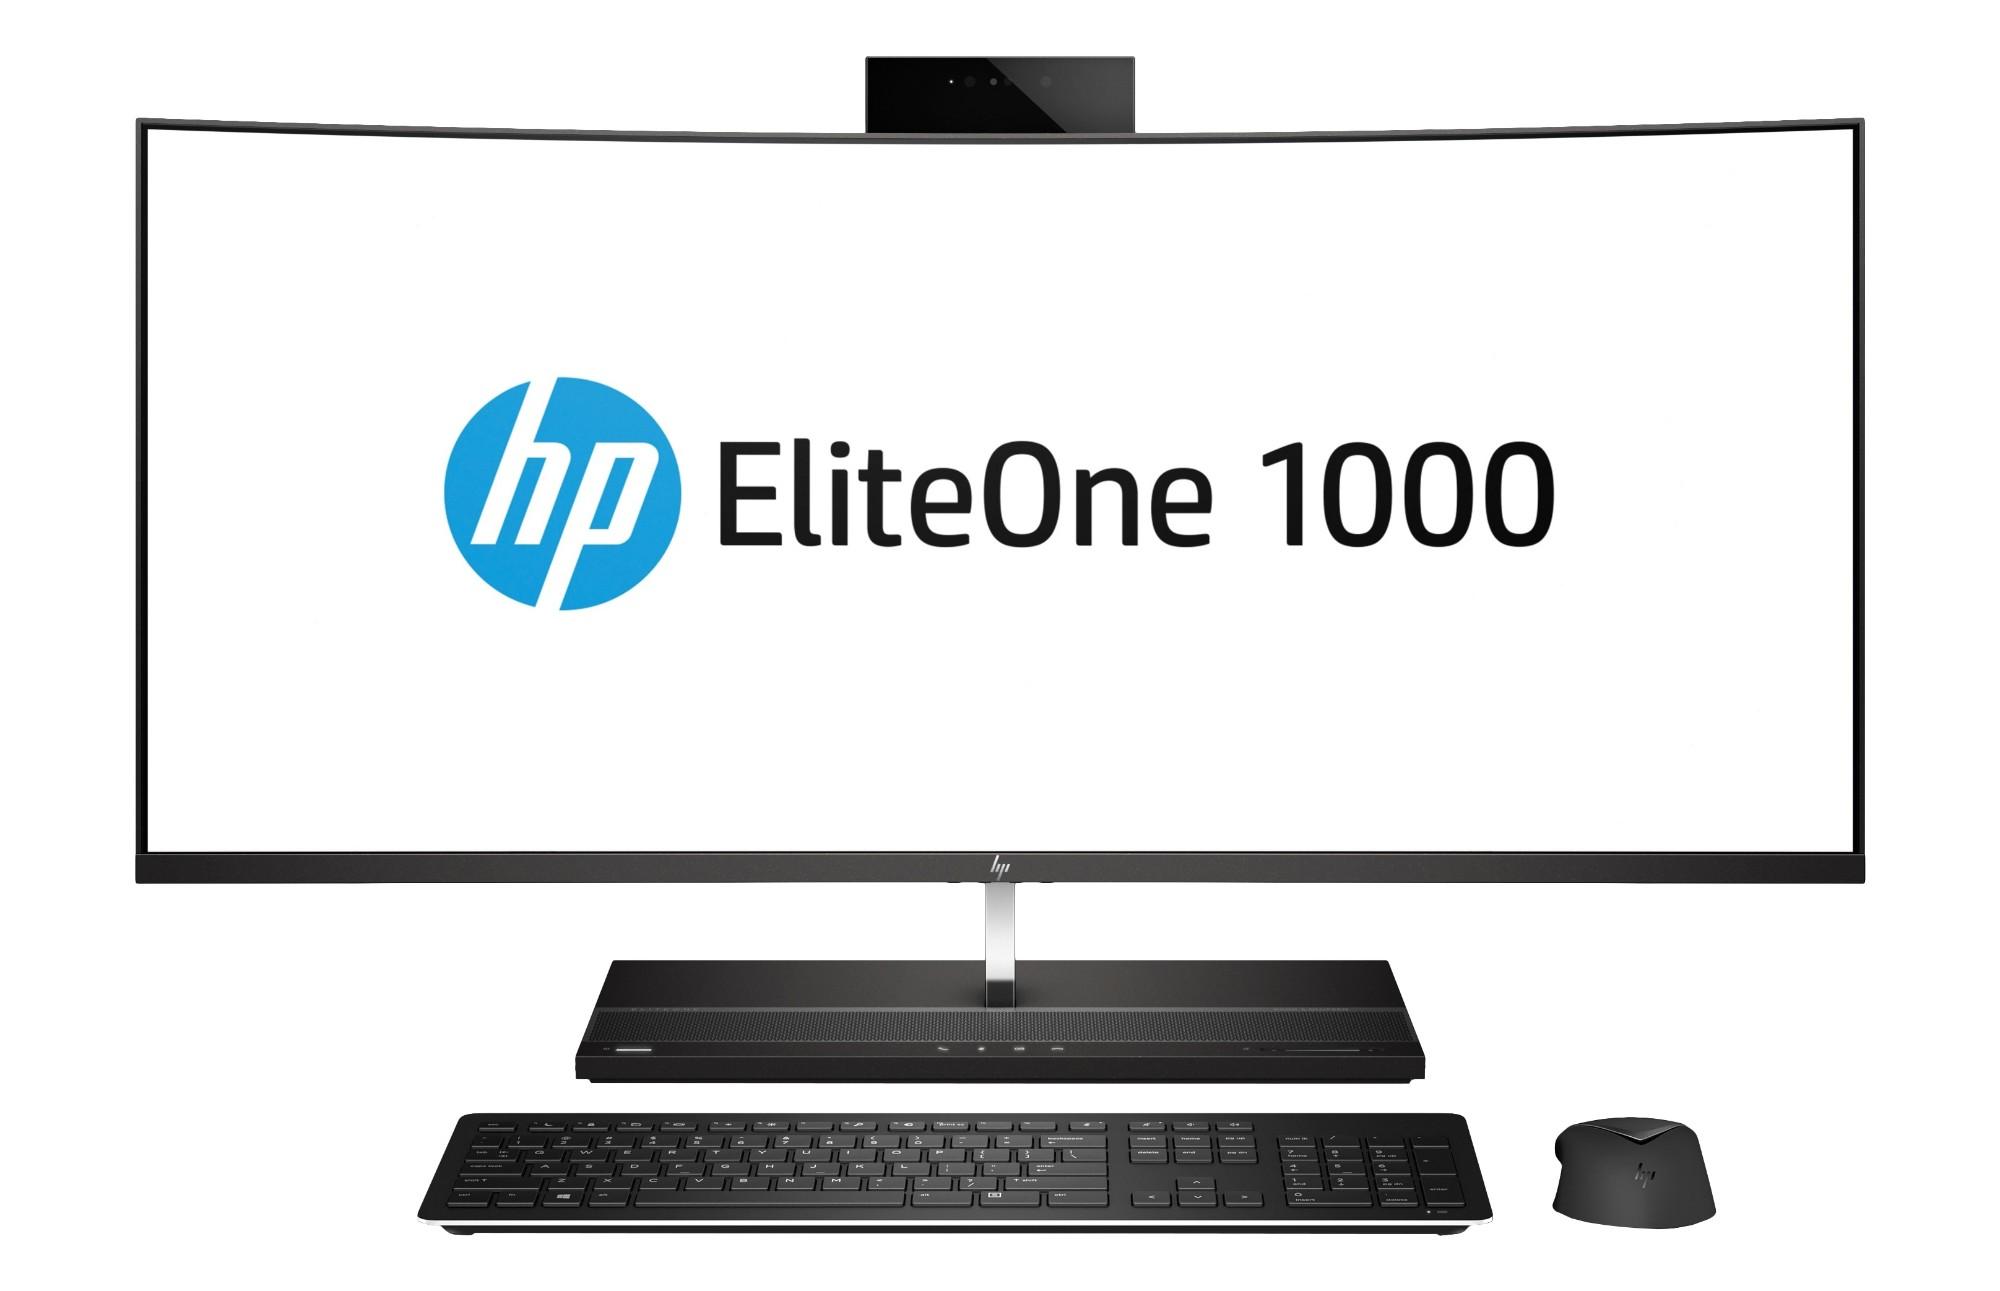 HP EliteOne 1000 G1 3.4GHz i5-7500 7th gen Intel® Core™ i5 34